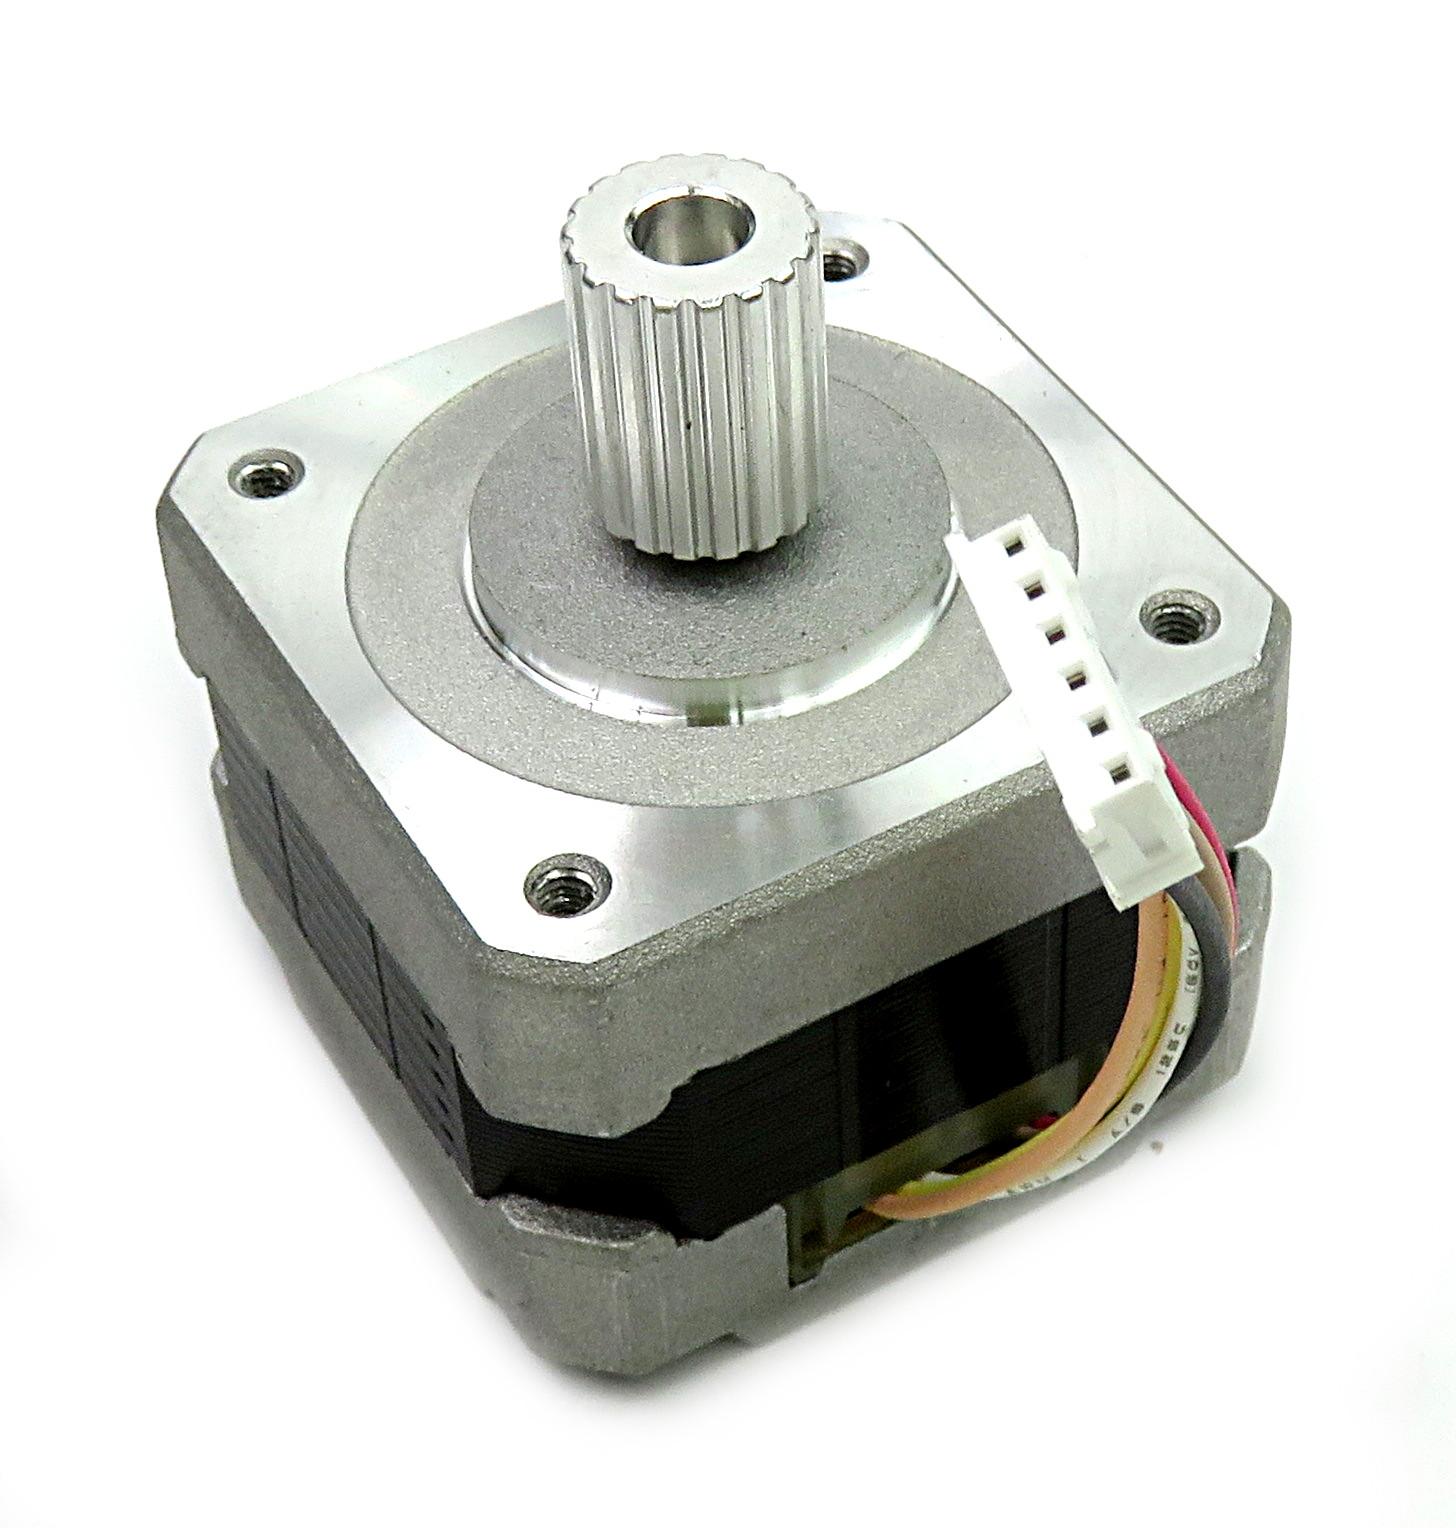 Shinano Kenshi STP-42D1057 1.8 degree/step 3.9 Ohm Stepper Motor w/ 11mm Gear